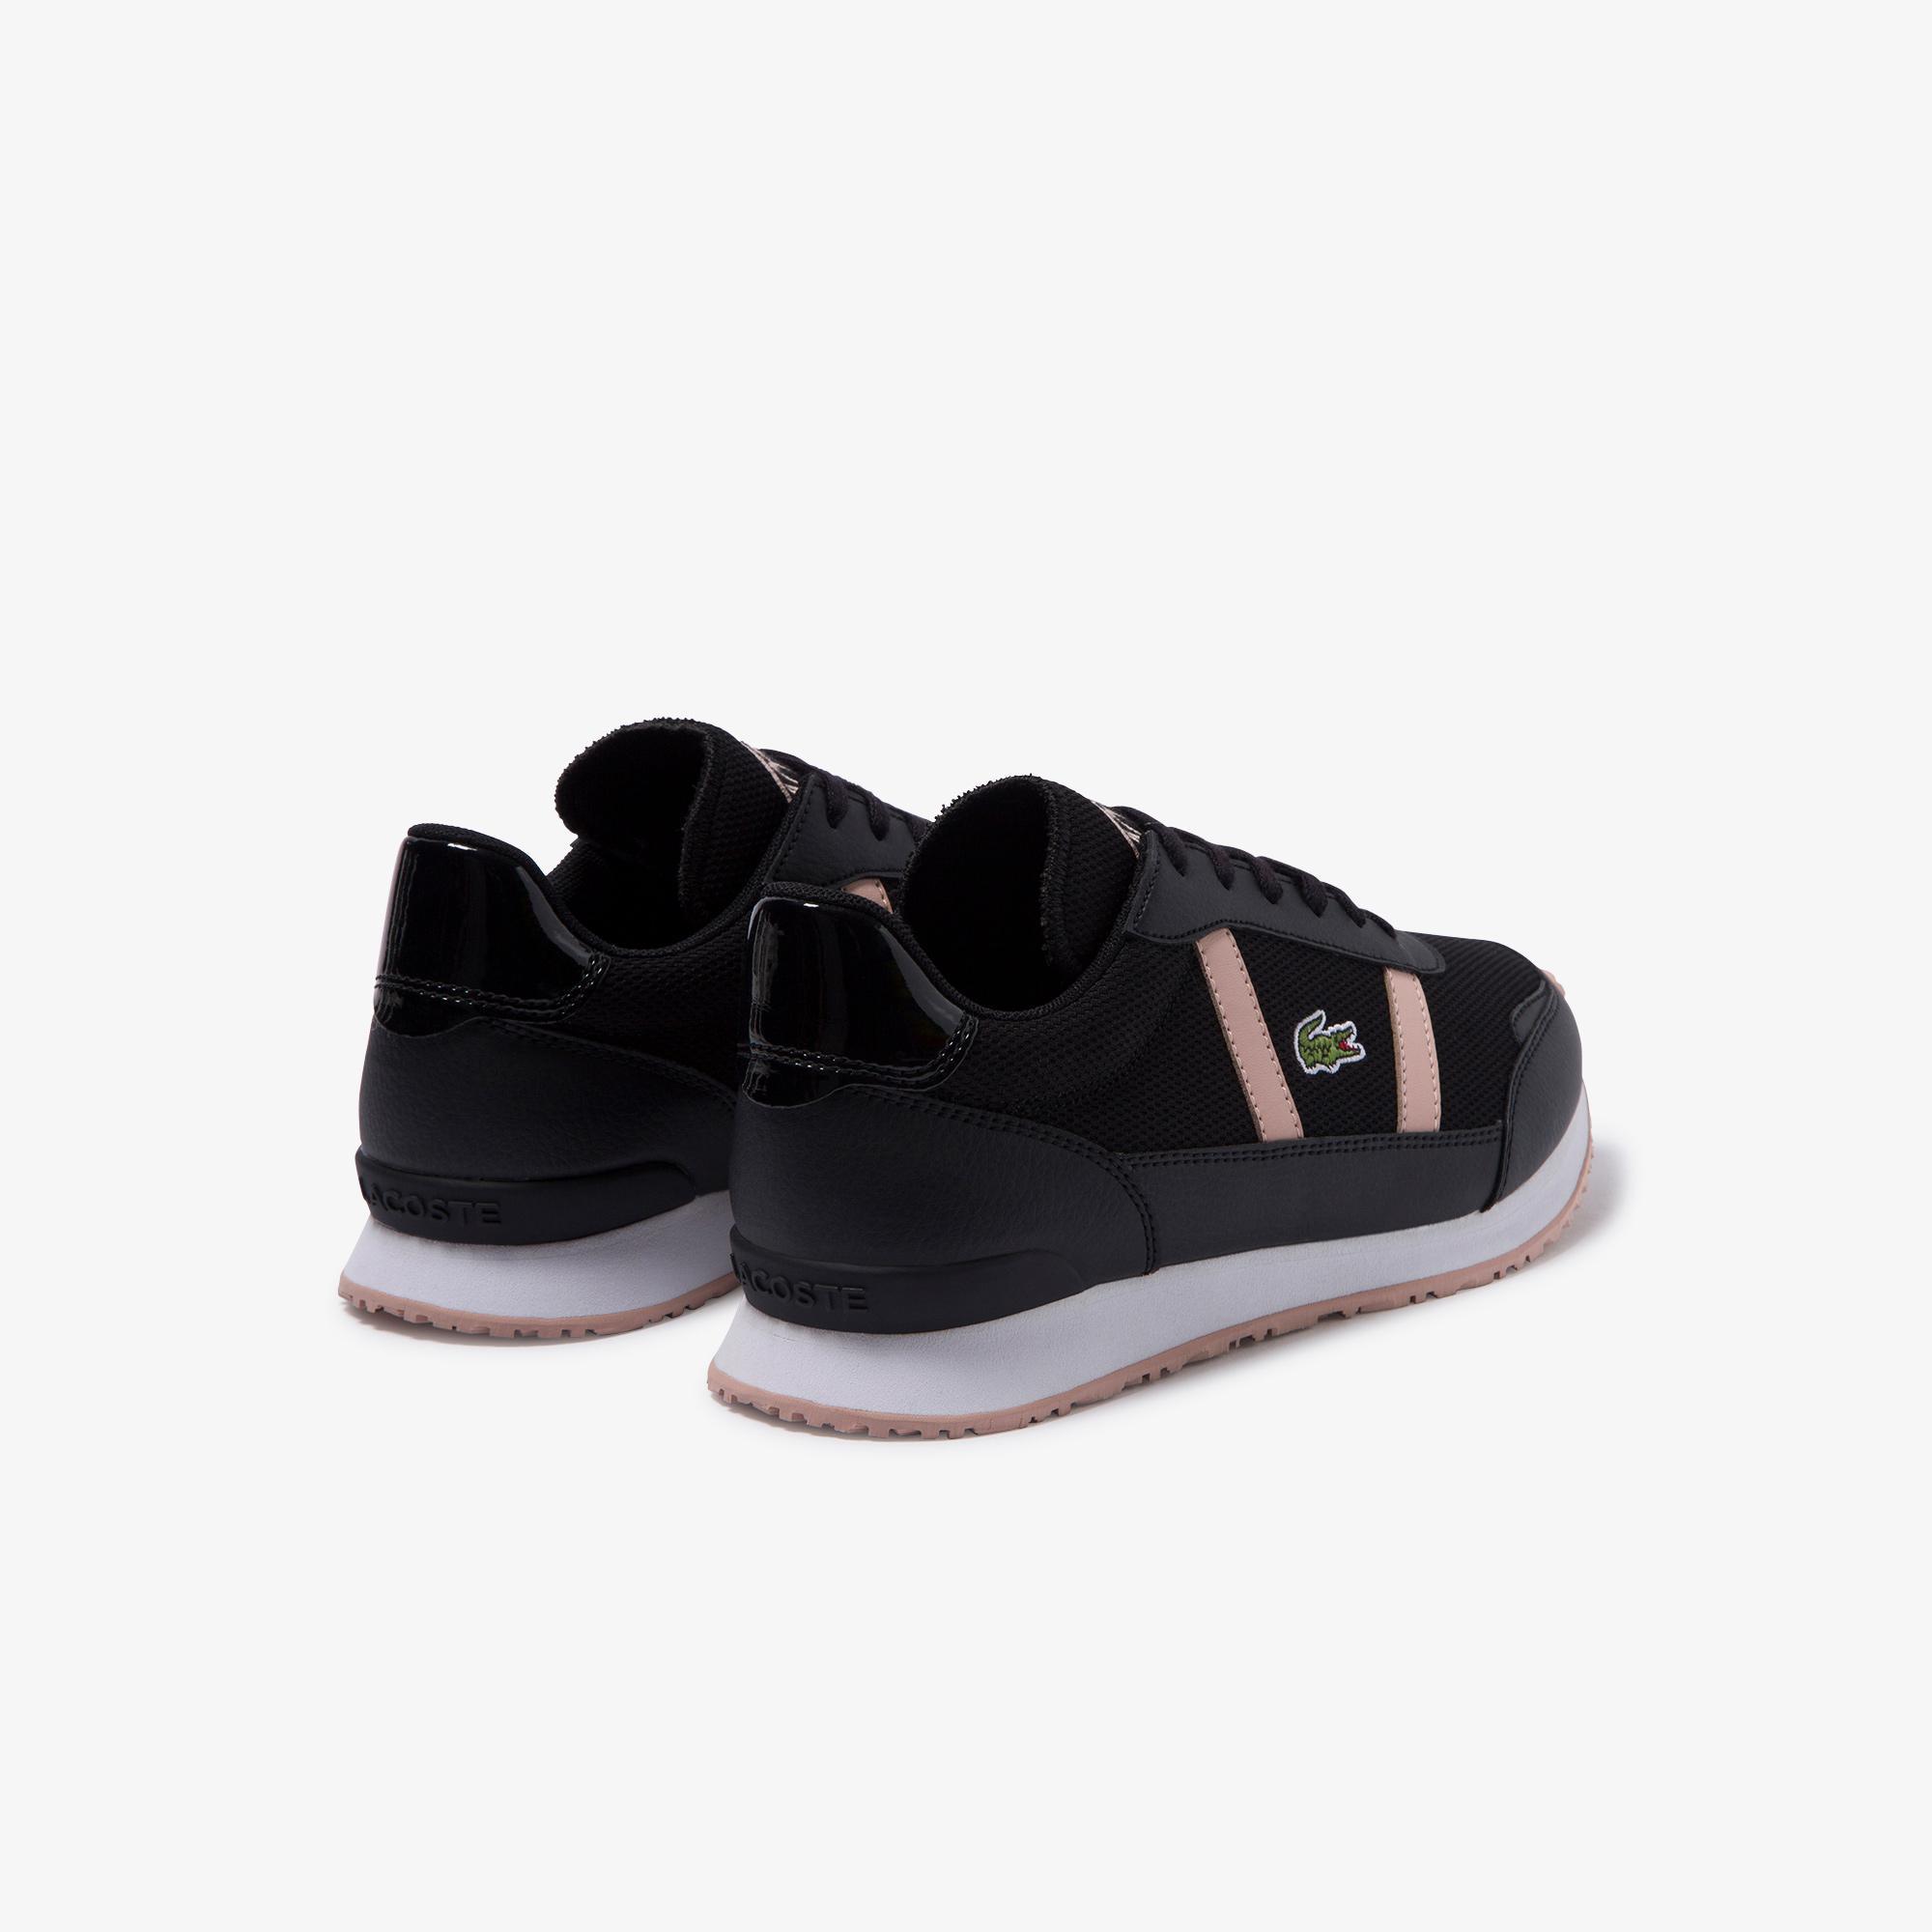 Lacoste Partner 220 2 Sfa Kadın Siyah - Pudra Sneaker